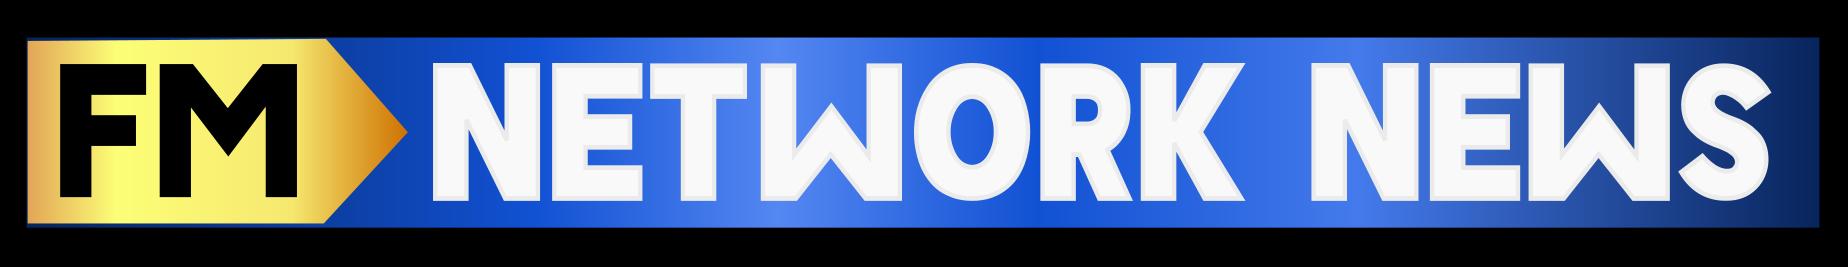 FM Network News